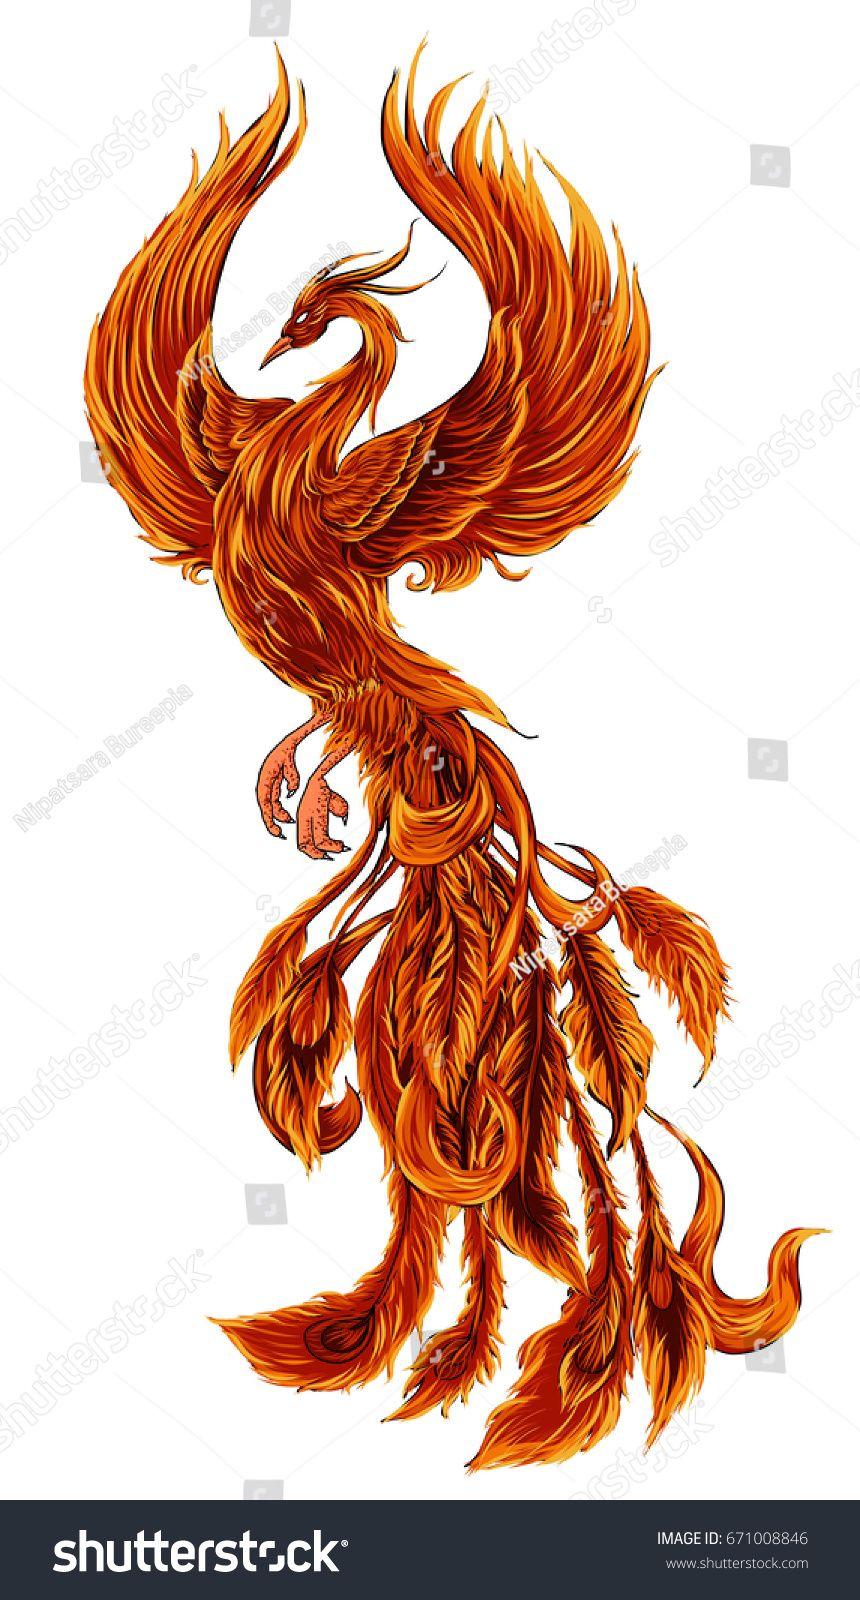 Phoenix Fire Bird Illustration And Character Design Hand Drawn Phoenix Tattoo Japanese And Chinese St Phoenix Bird Tattoos Phoenix Tattoo Design Phoenix Tattoo